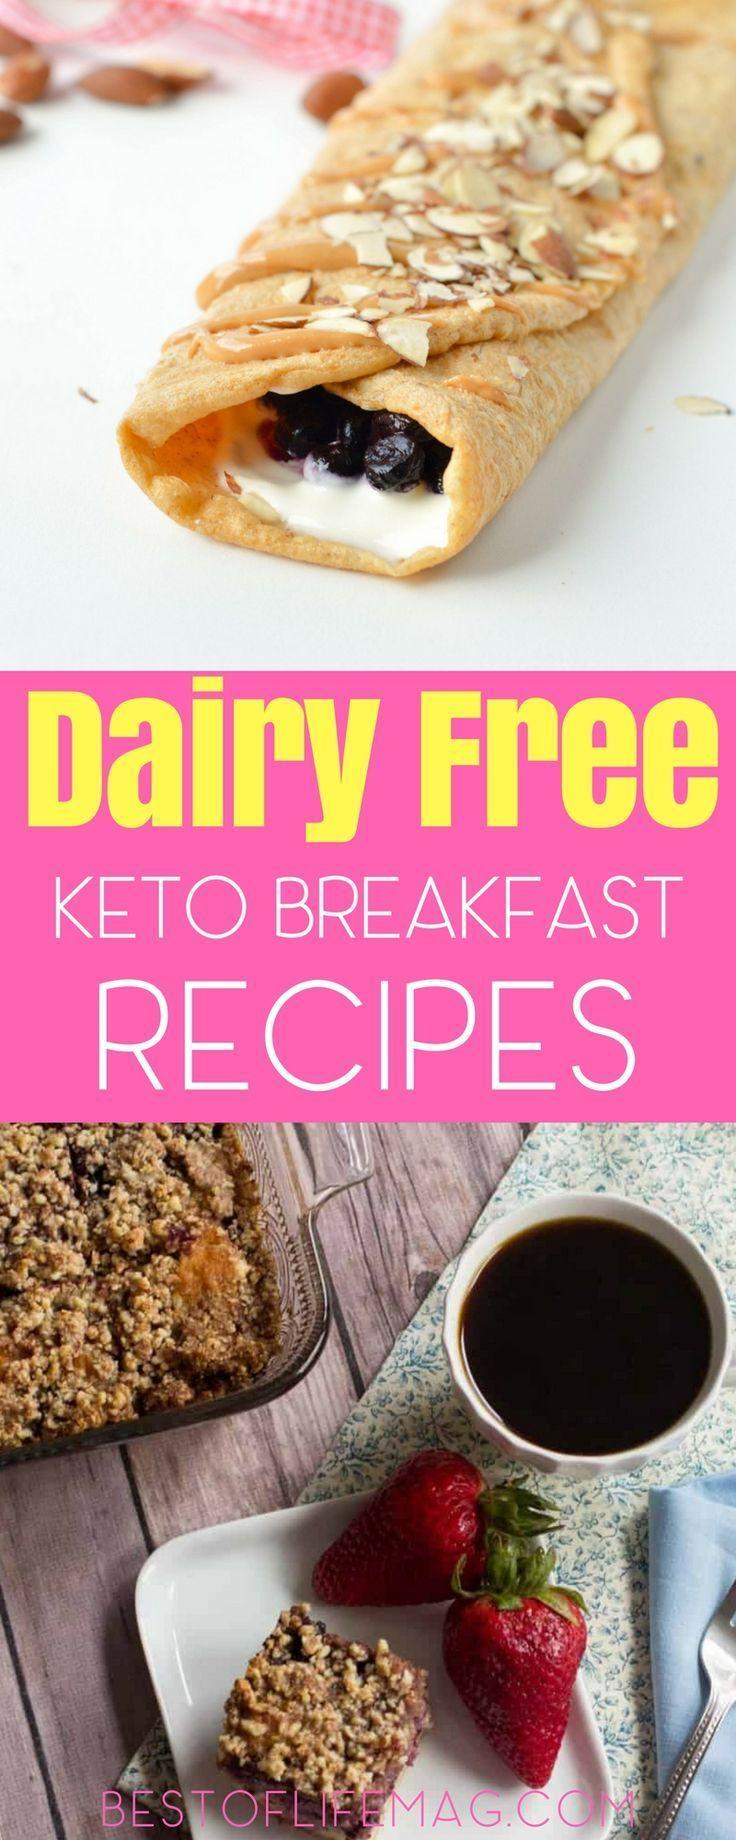 Dairy Free Keto Breakfast Recipes. #keto #ketorecipes #ketohealth #ketodairyfree #dairyfree #dairyfreesmoothie